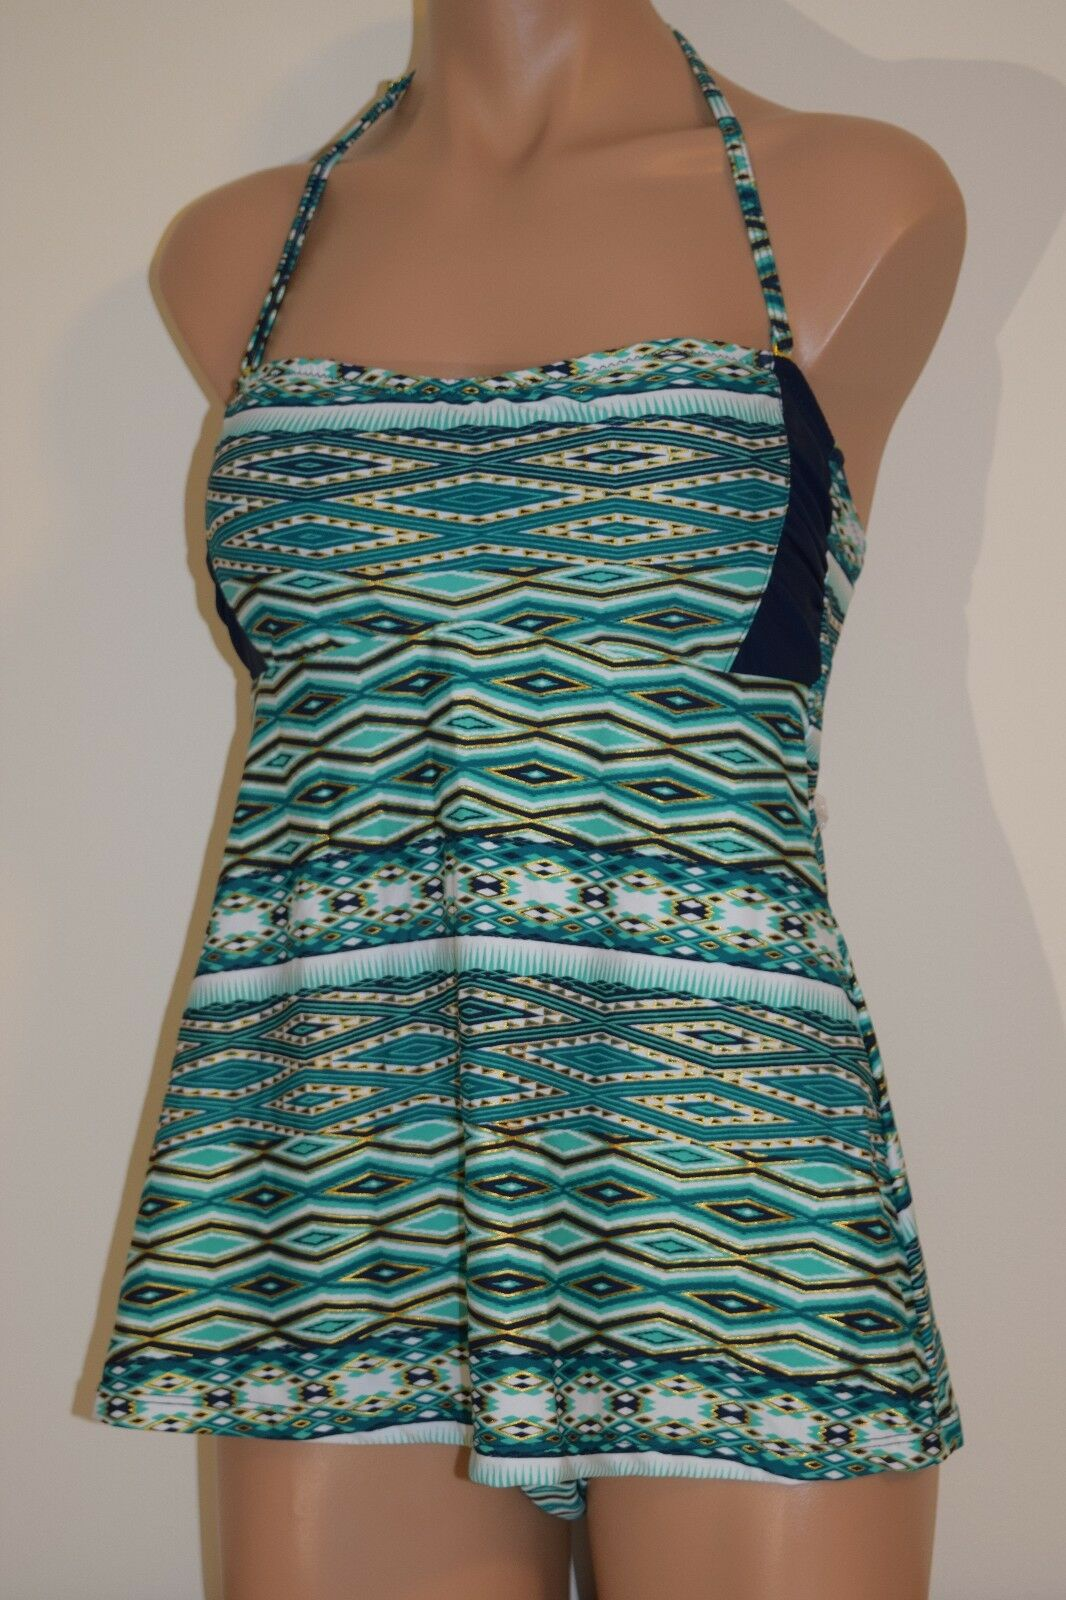 328d54206b521 Strap Sz M NWT Jessica Simpson Swimsuit Swimsuit Swimsuit Tankini 2pc Set  Navy Green Remov.